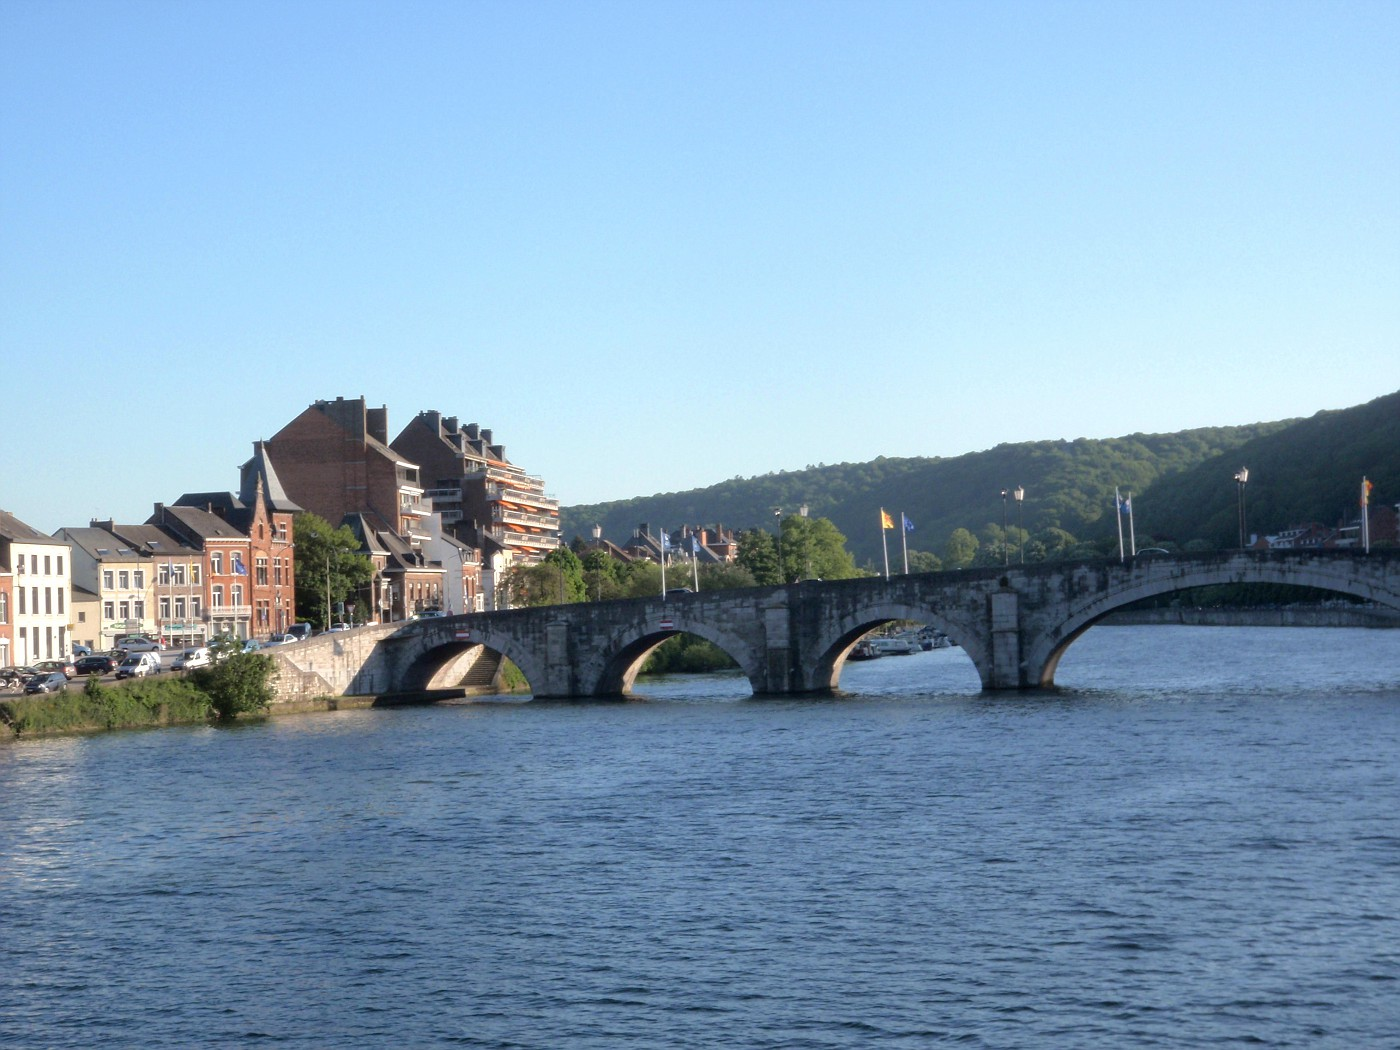 Meuse et Pont de Jambes